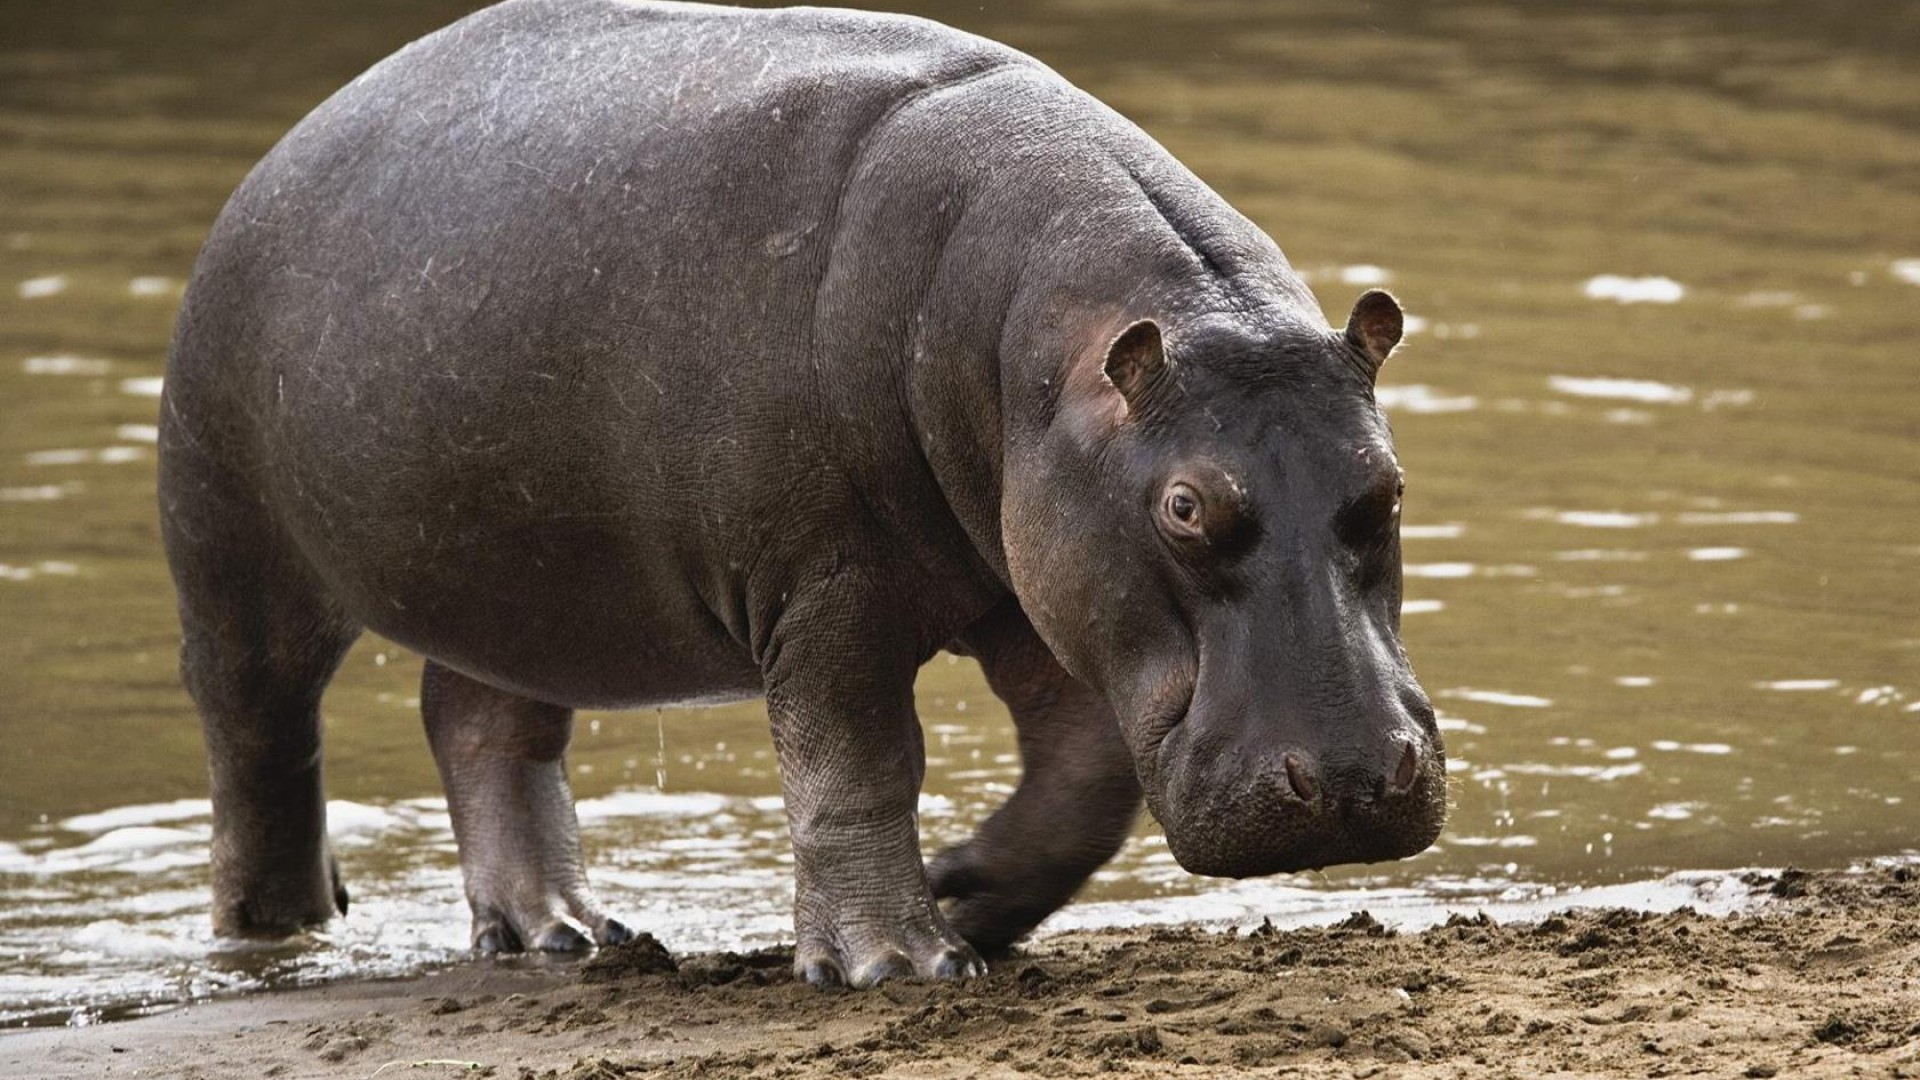 Coloriage hippopotame et dessin imprimer - Dessin d hippopotame ...